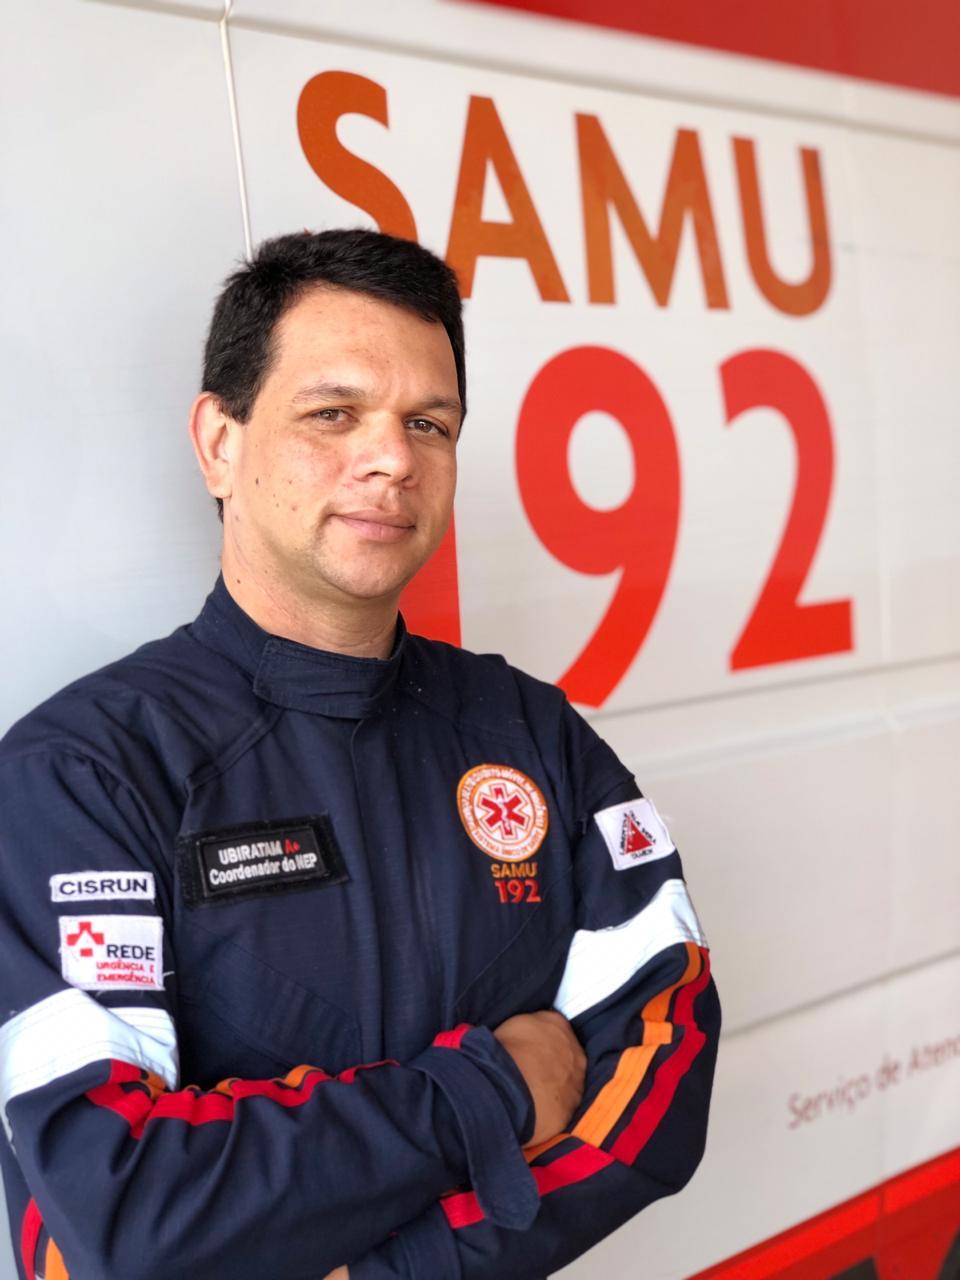 Ubiratam Lopes Correia